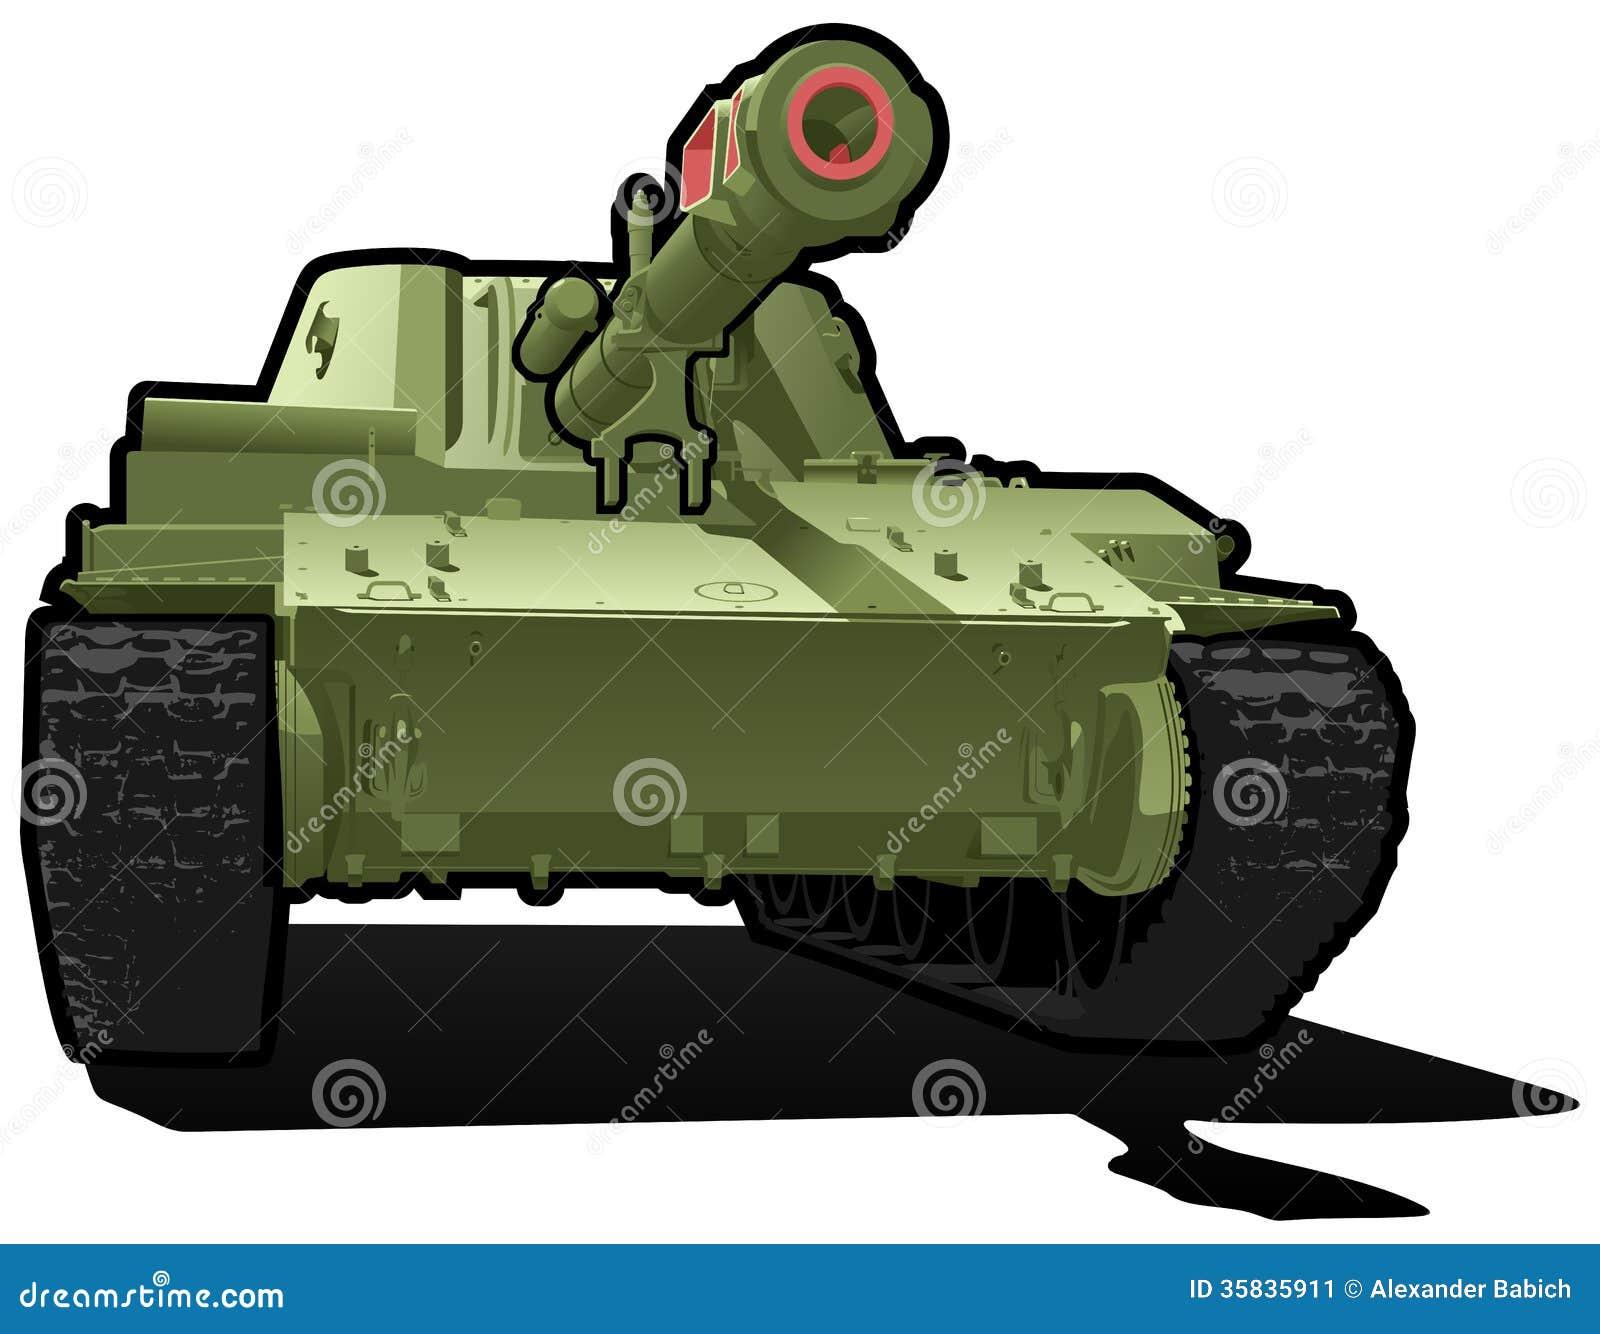 Simple Cartoon Tank